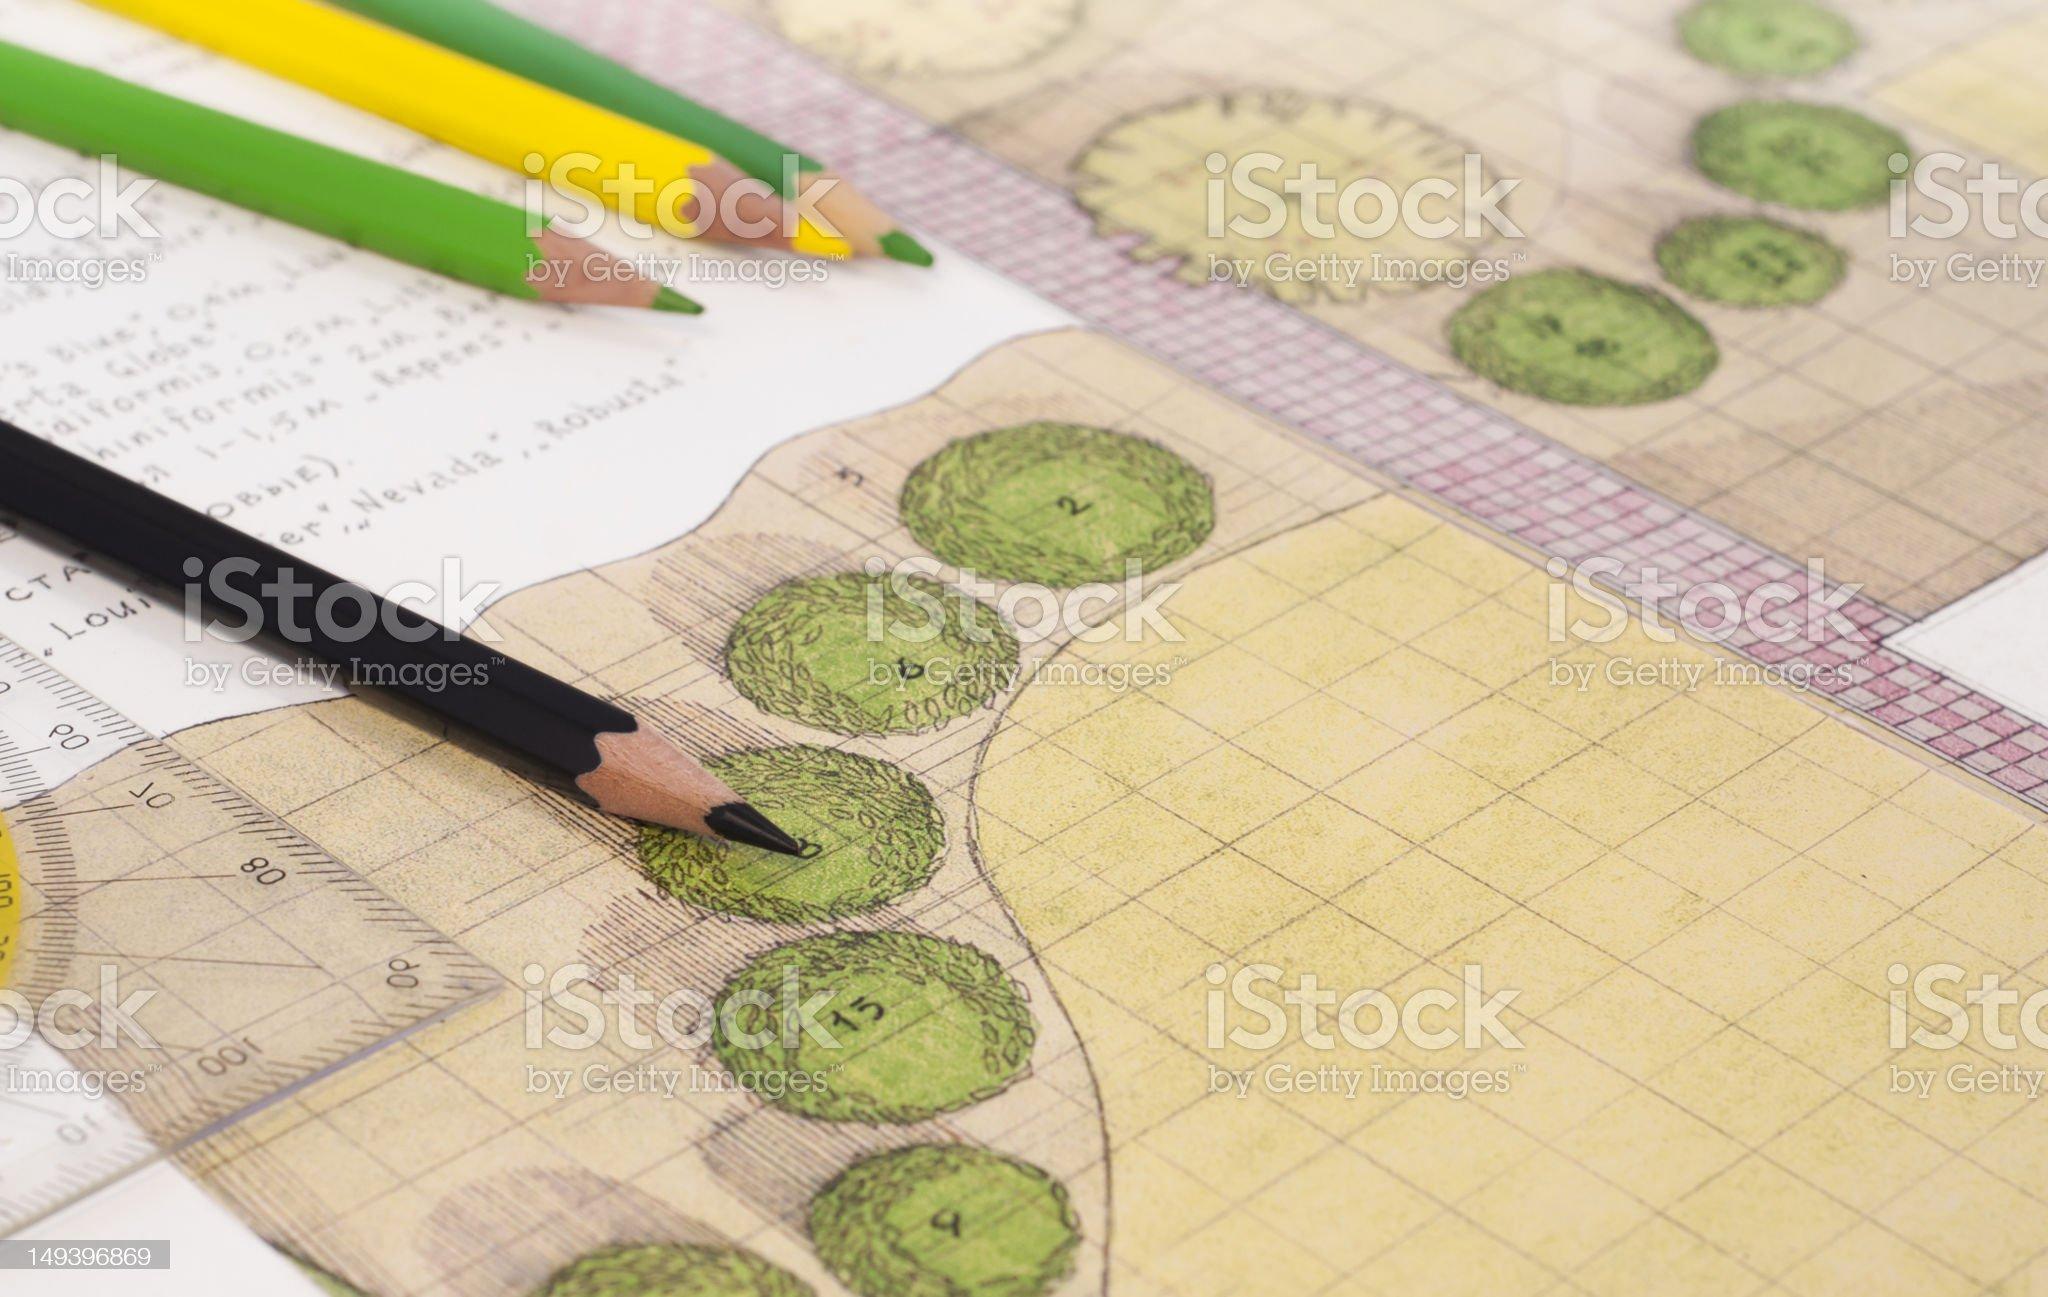 Landscape architect drawing royalty-free stock photo